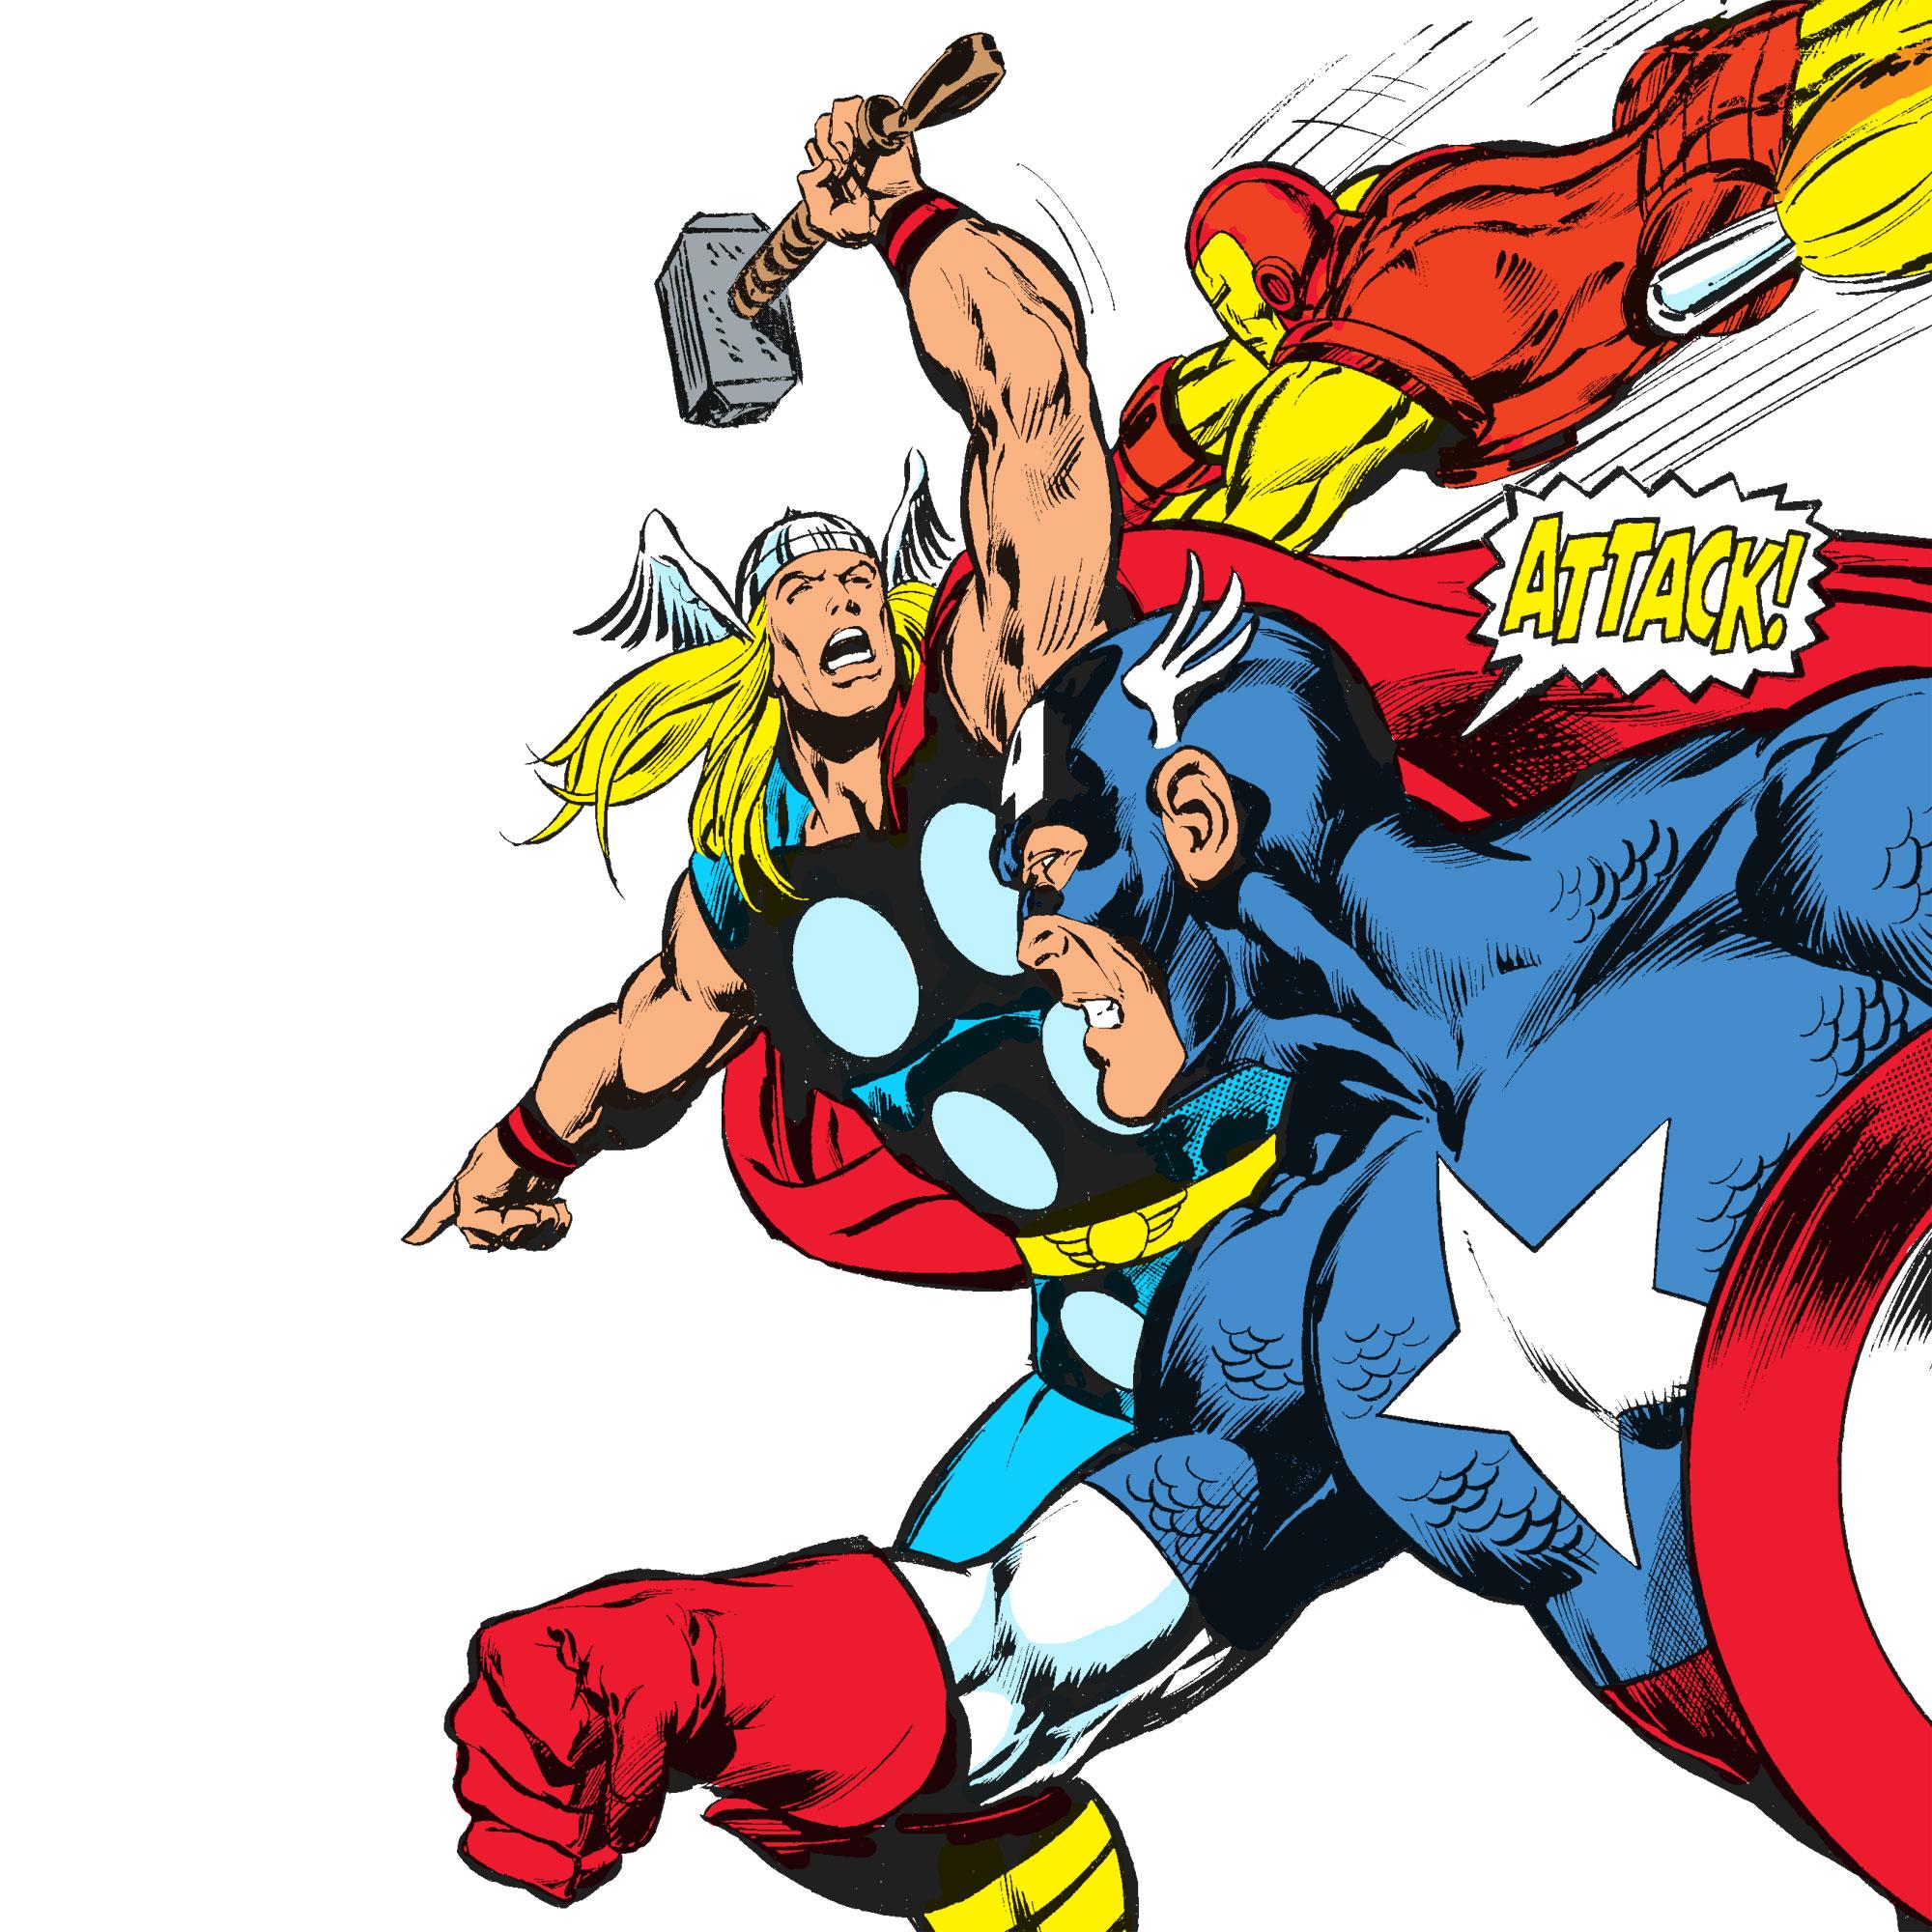 Avengers Assemble! - May 12 – Oct 7, 2012